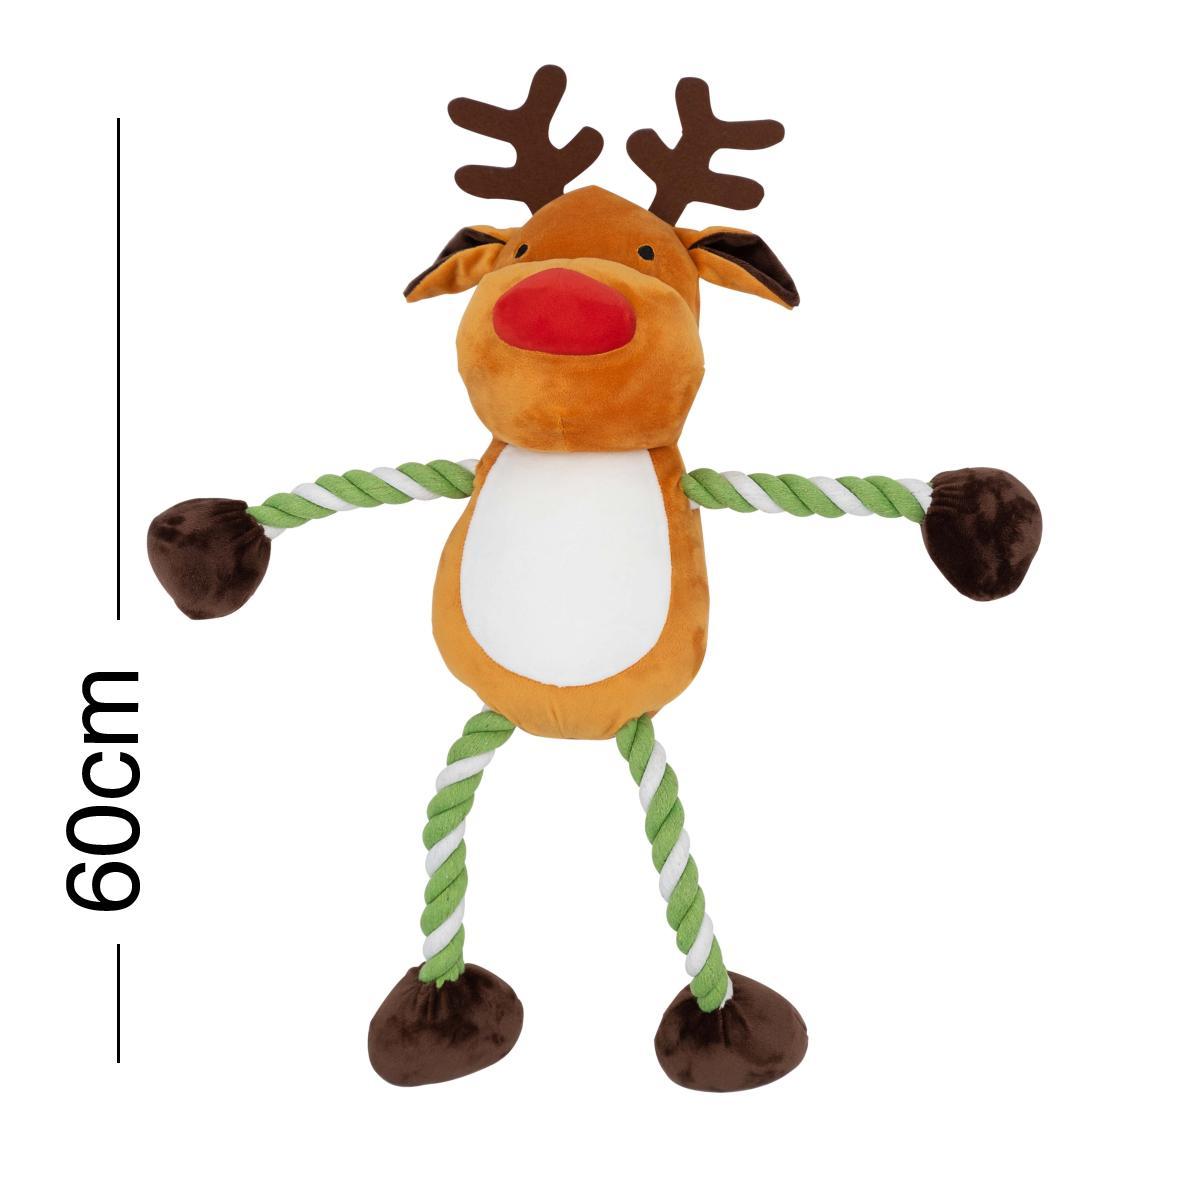 CLEARANCE Good Boy Hug Tug Reindeer Large 60cm